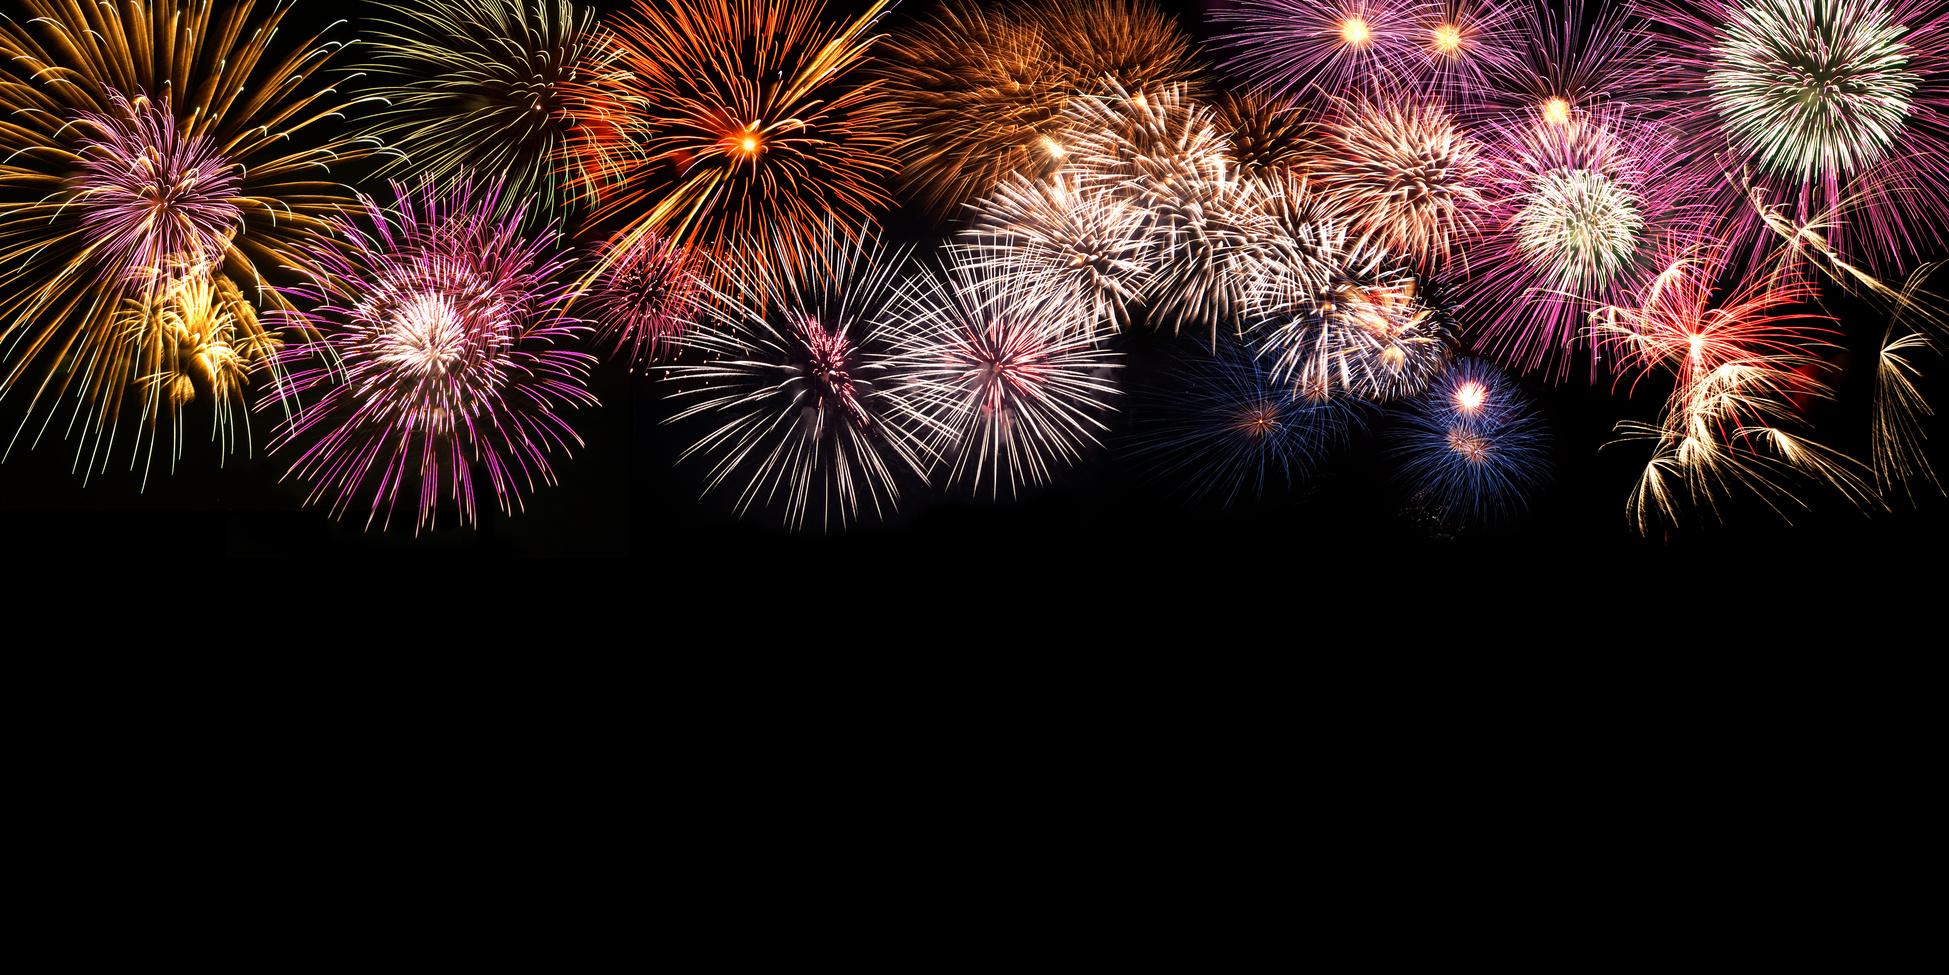 Bilder Feuerwerk Kostenlos Downloaden